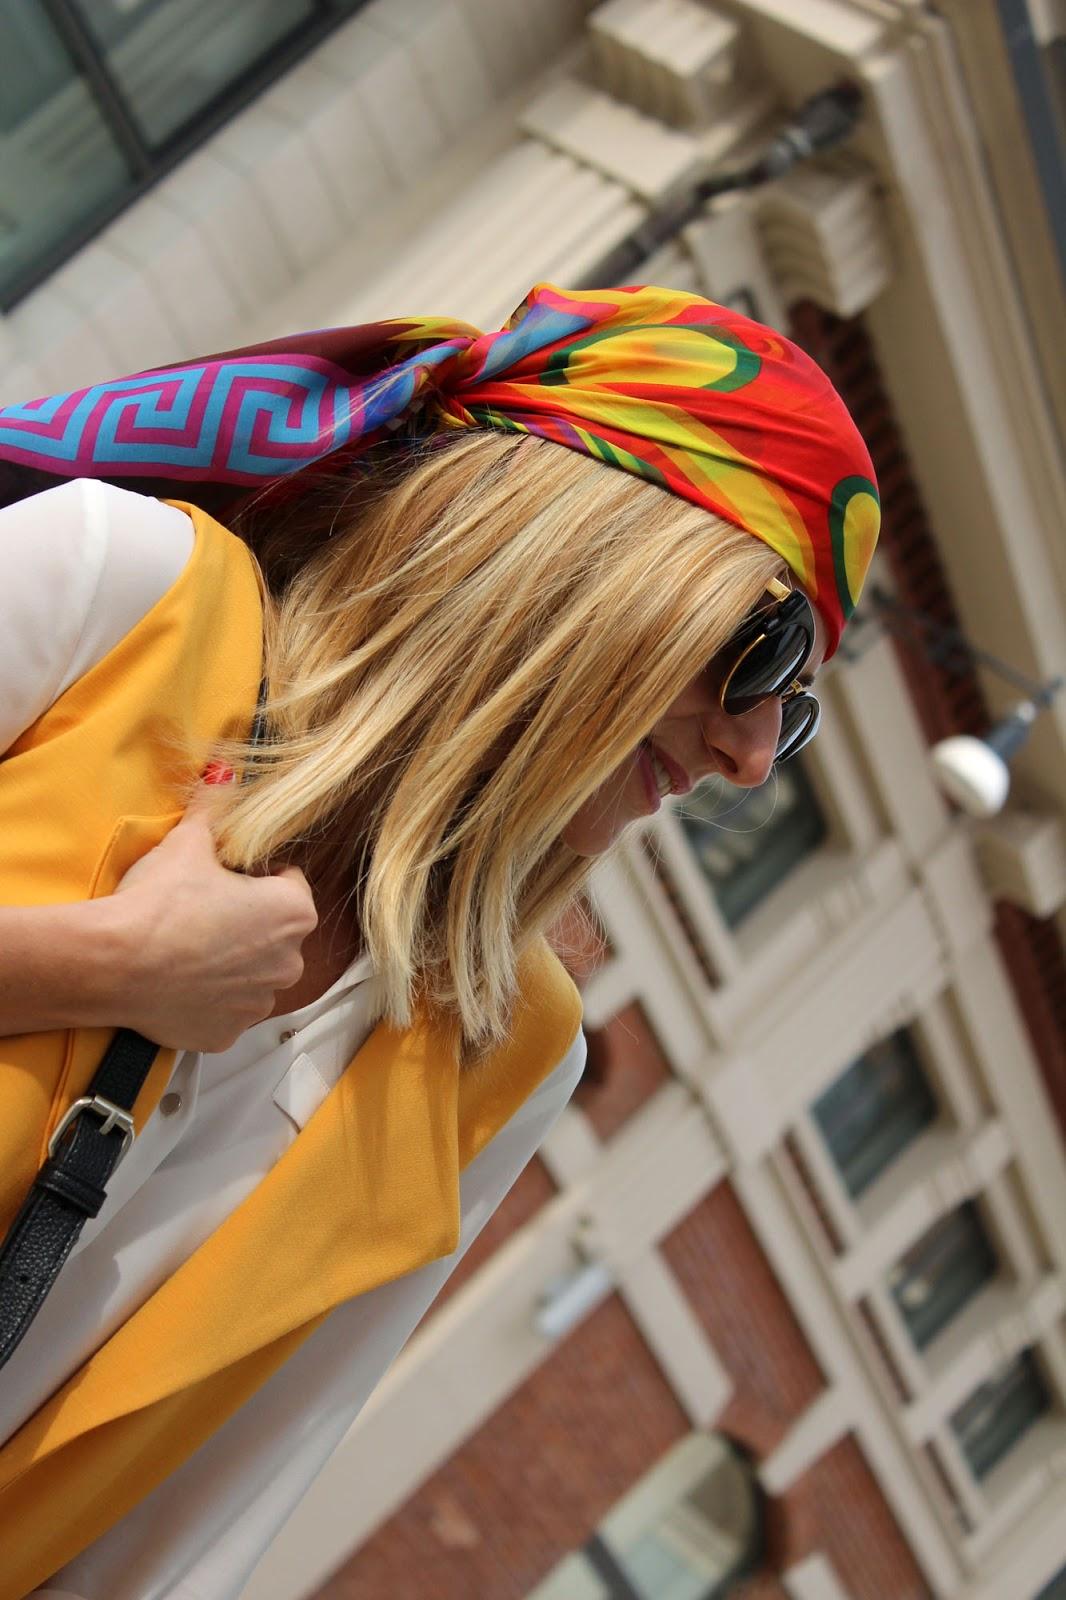 Eniwhere Fashion - Sheinside yellow coat - cappottino giallo-arancio